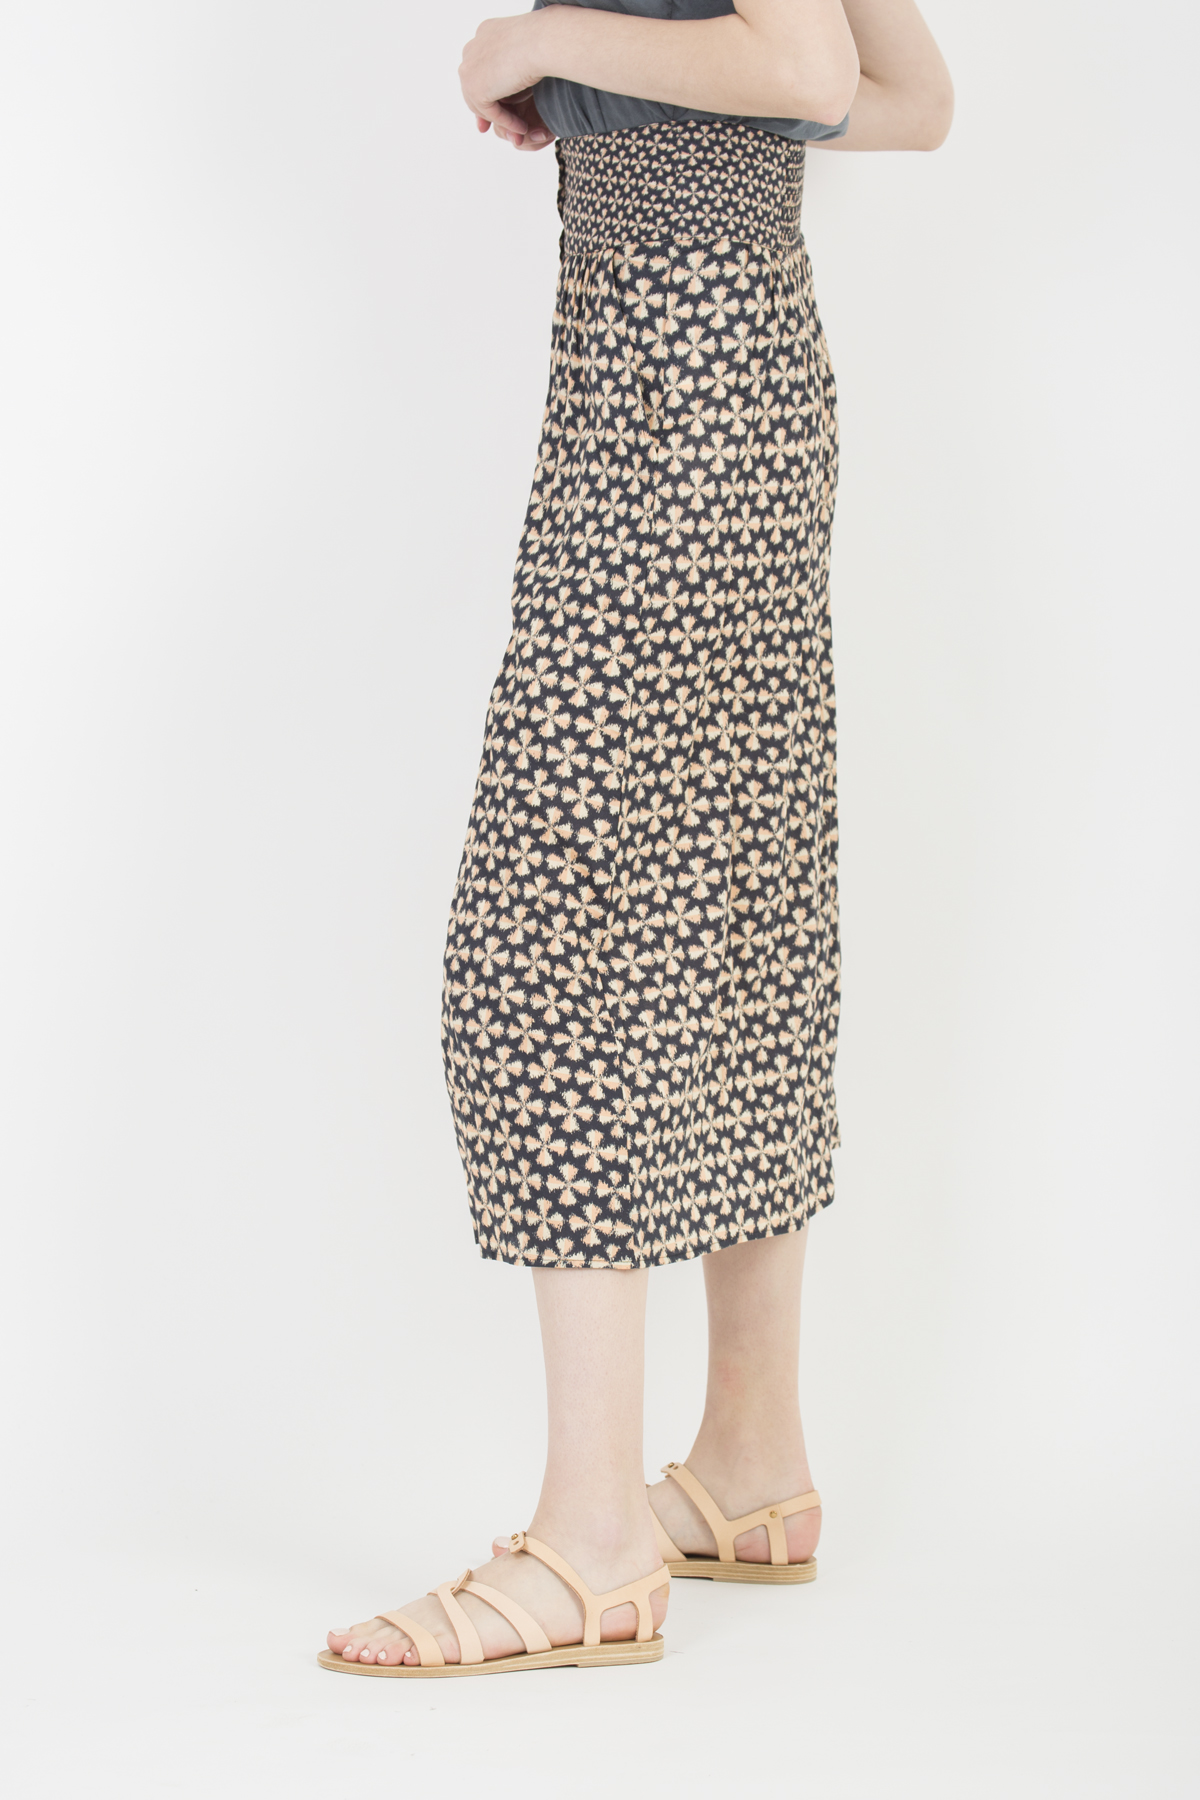 cylia-black-print-skirt-bash-matchboxathens